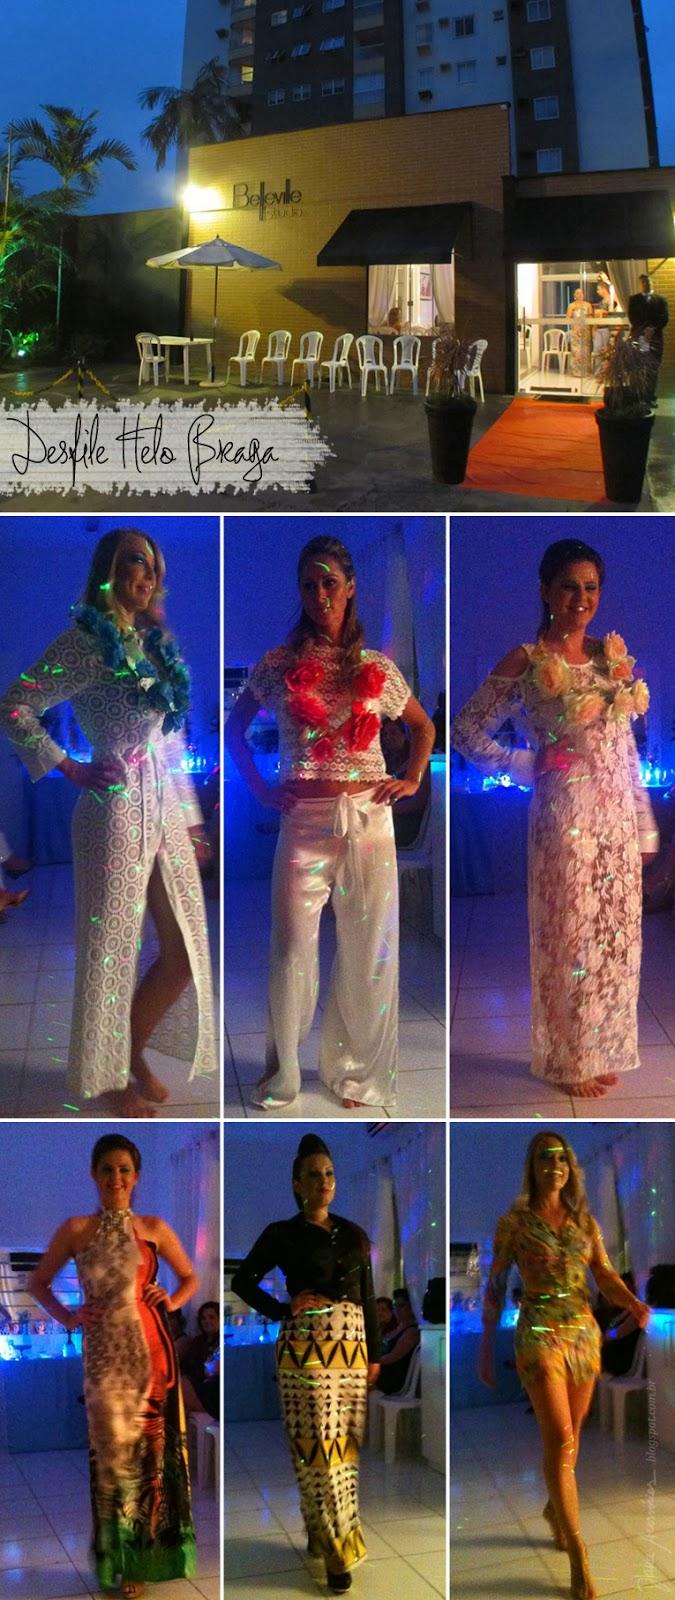 Desfile Helo Braga, Evento, Belleville Studio, Joinville,